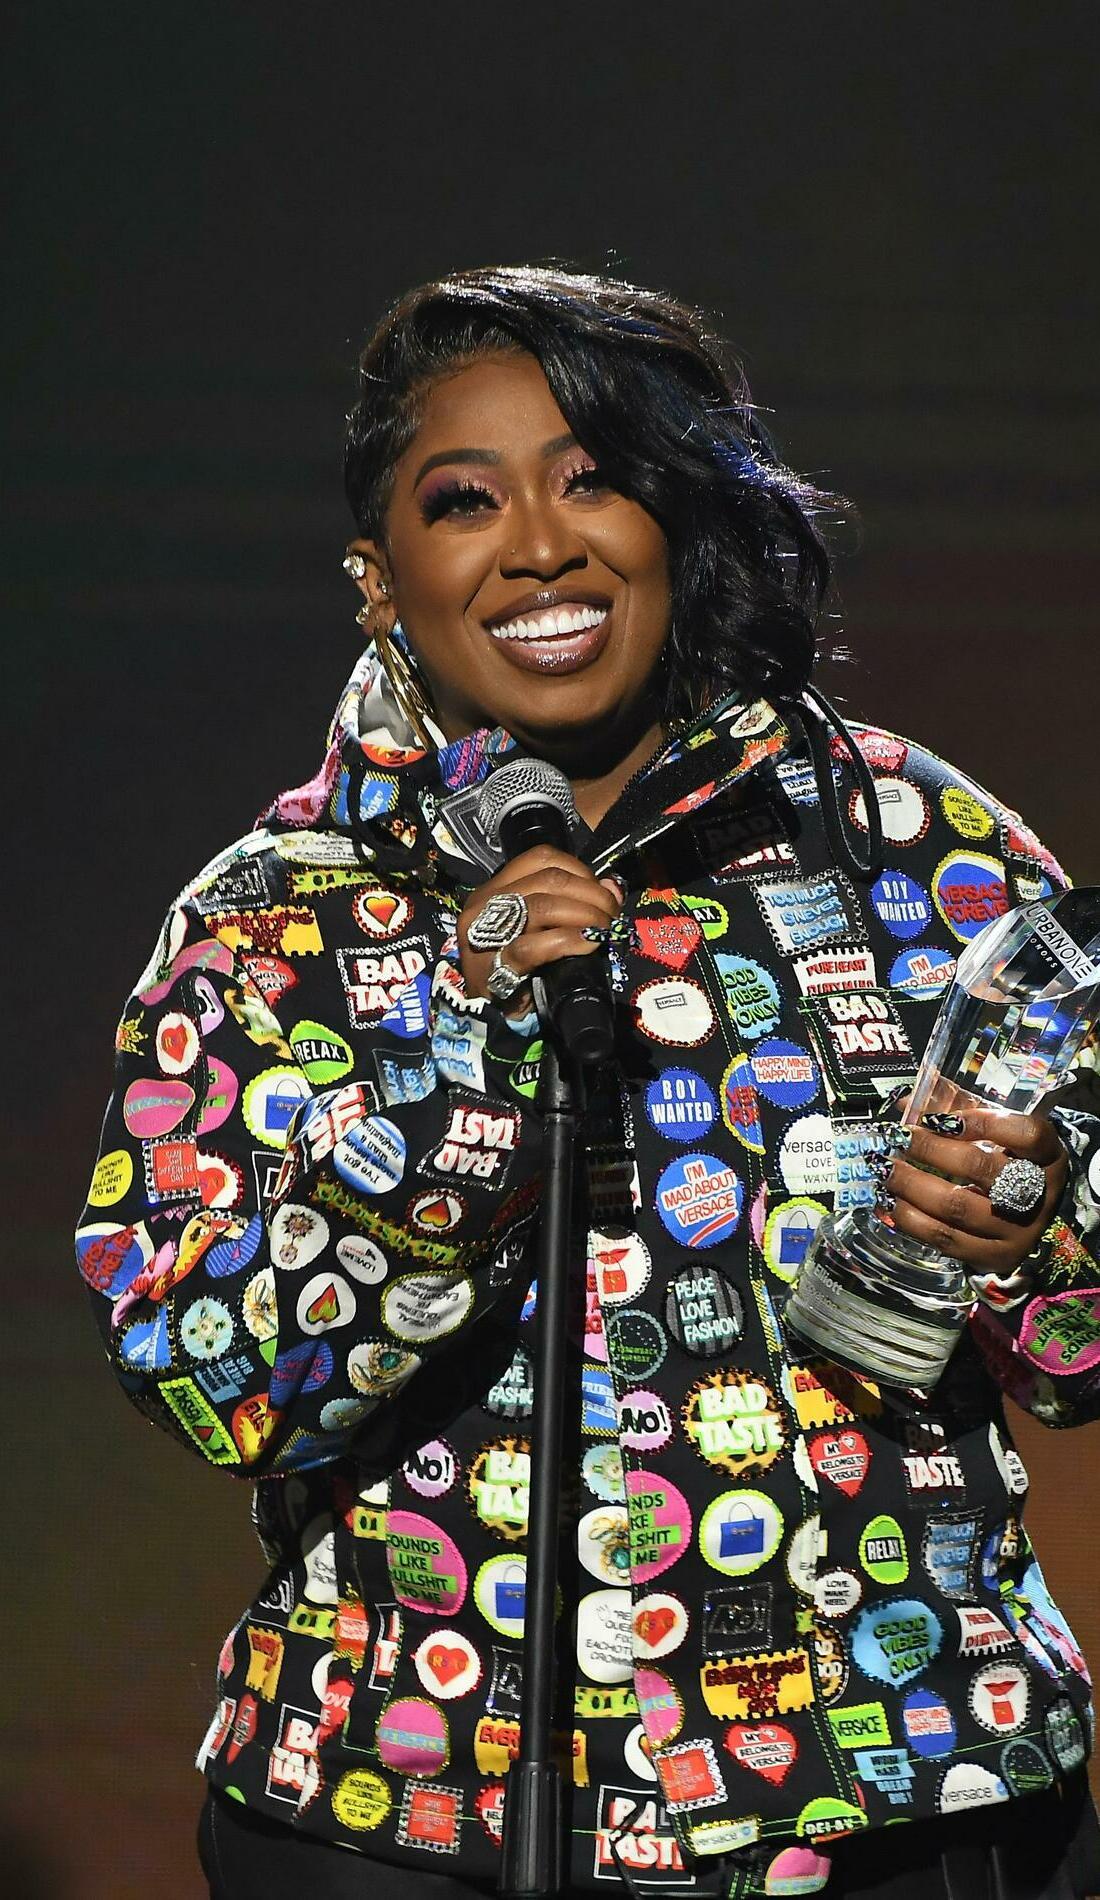 A Missy Elliott live event